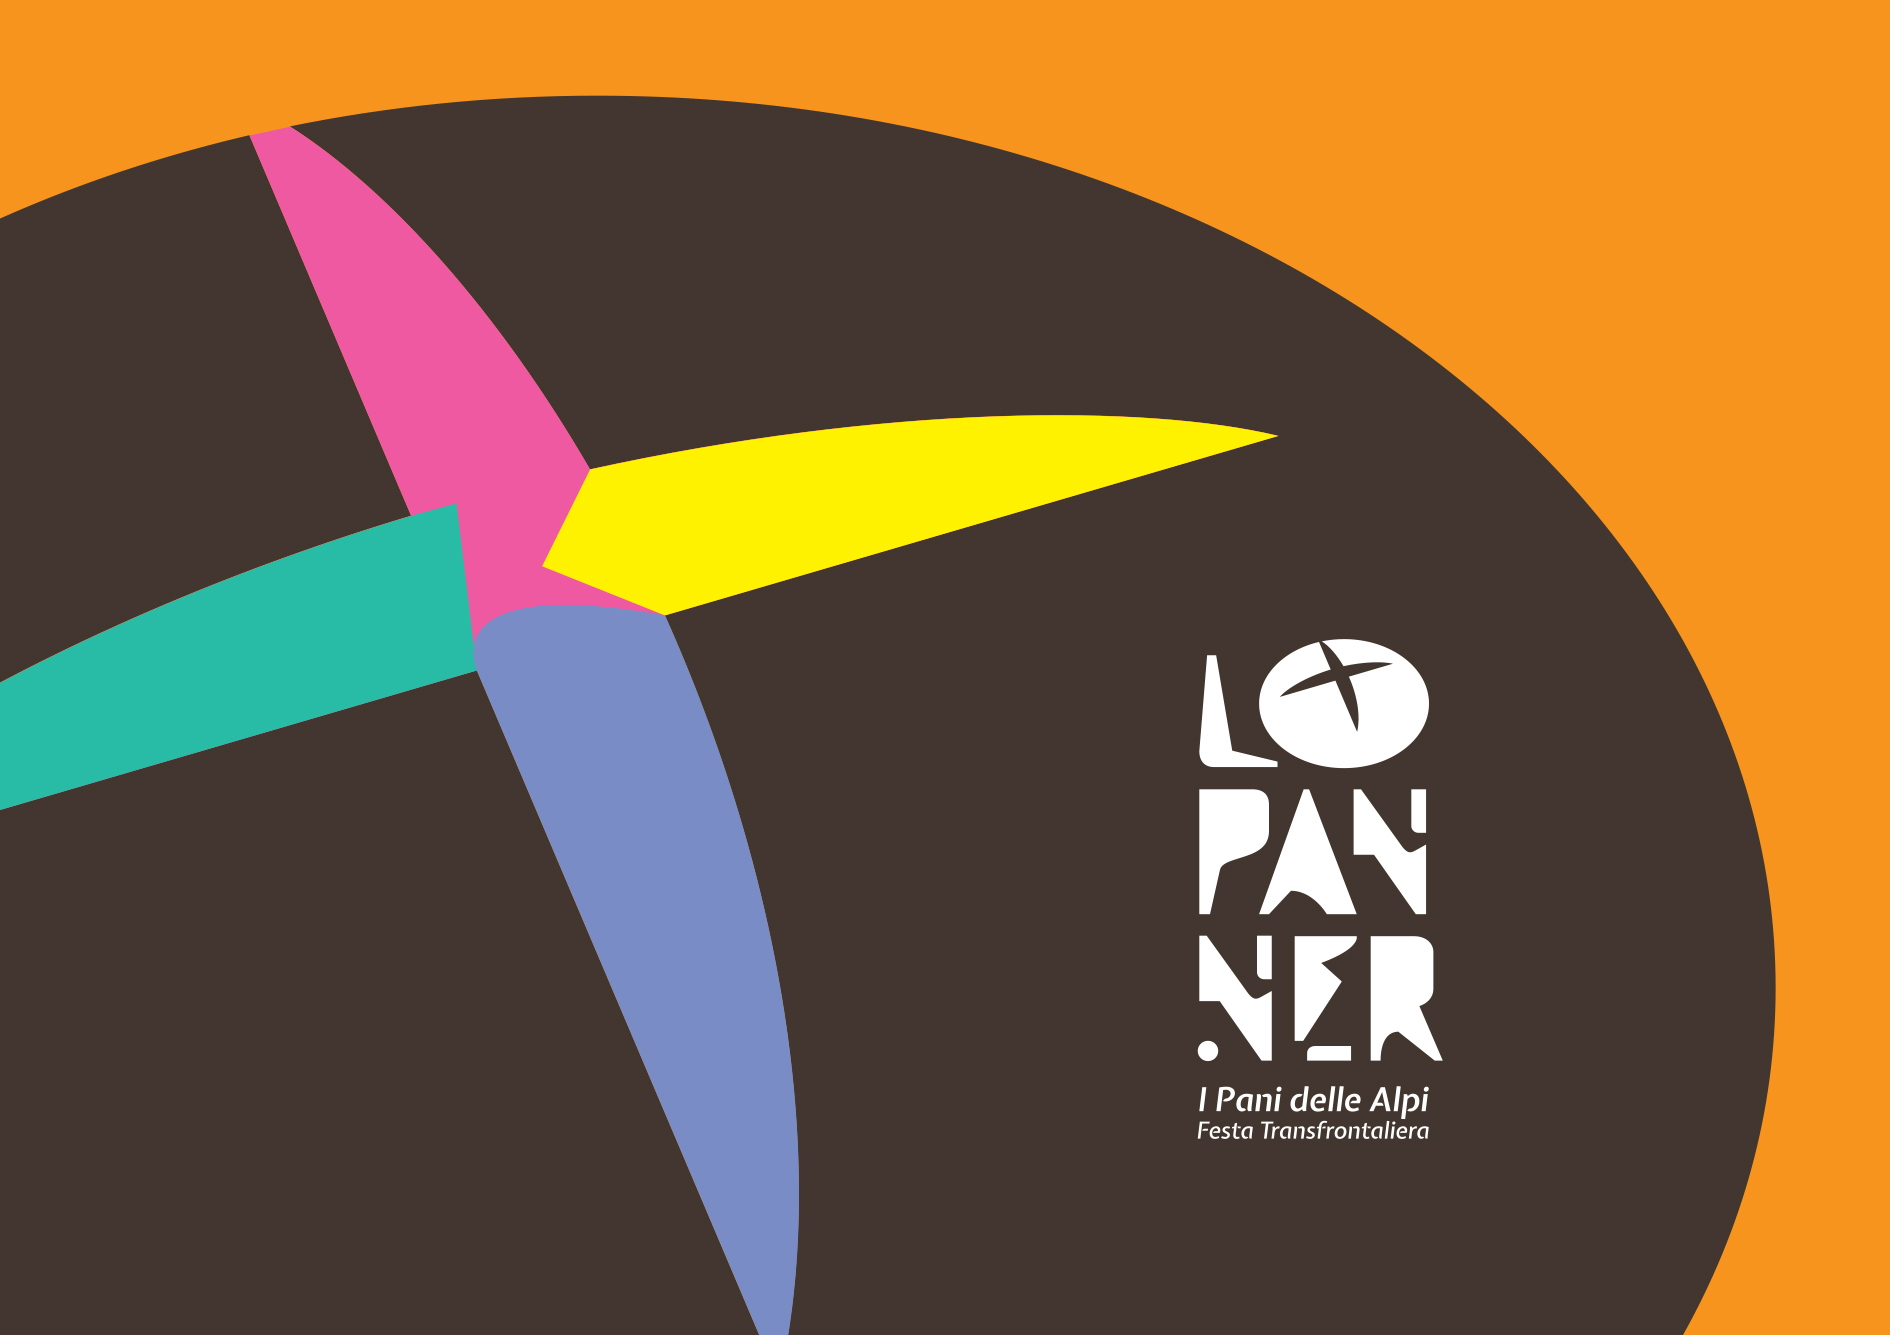 Festa de Lo Pan Ner 2021 - 2/3 ottobre 2021